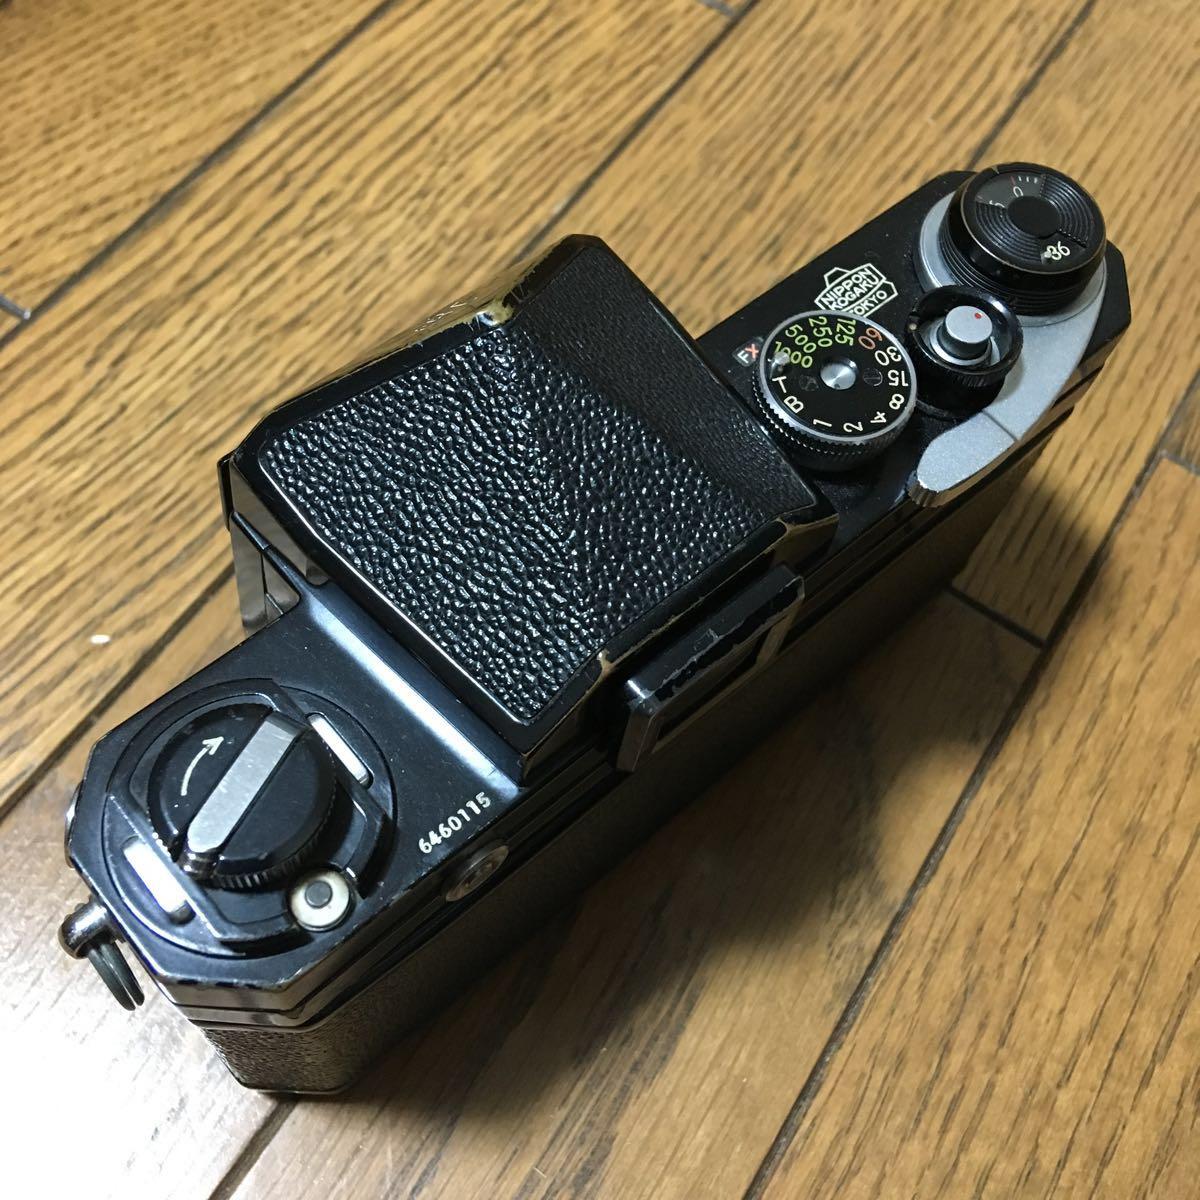 Nikon F アイレベル ブラック ボディ 646万台 前期型 動作確認済みです。_画像10